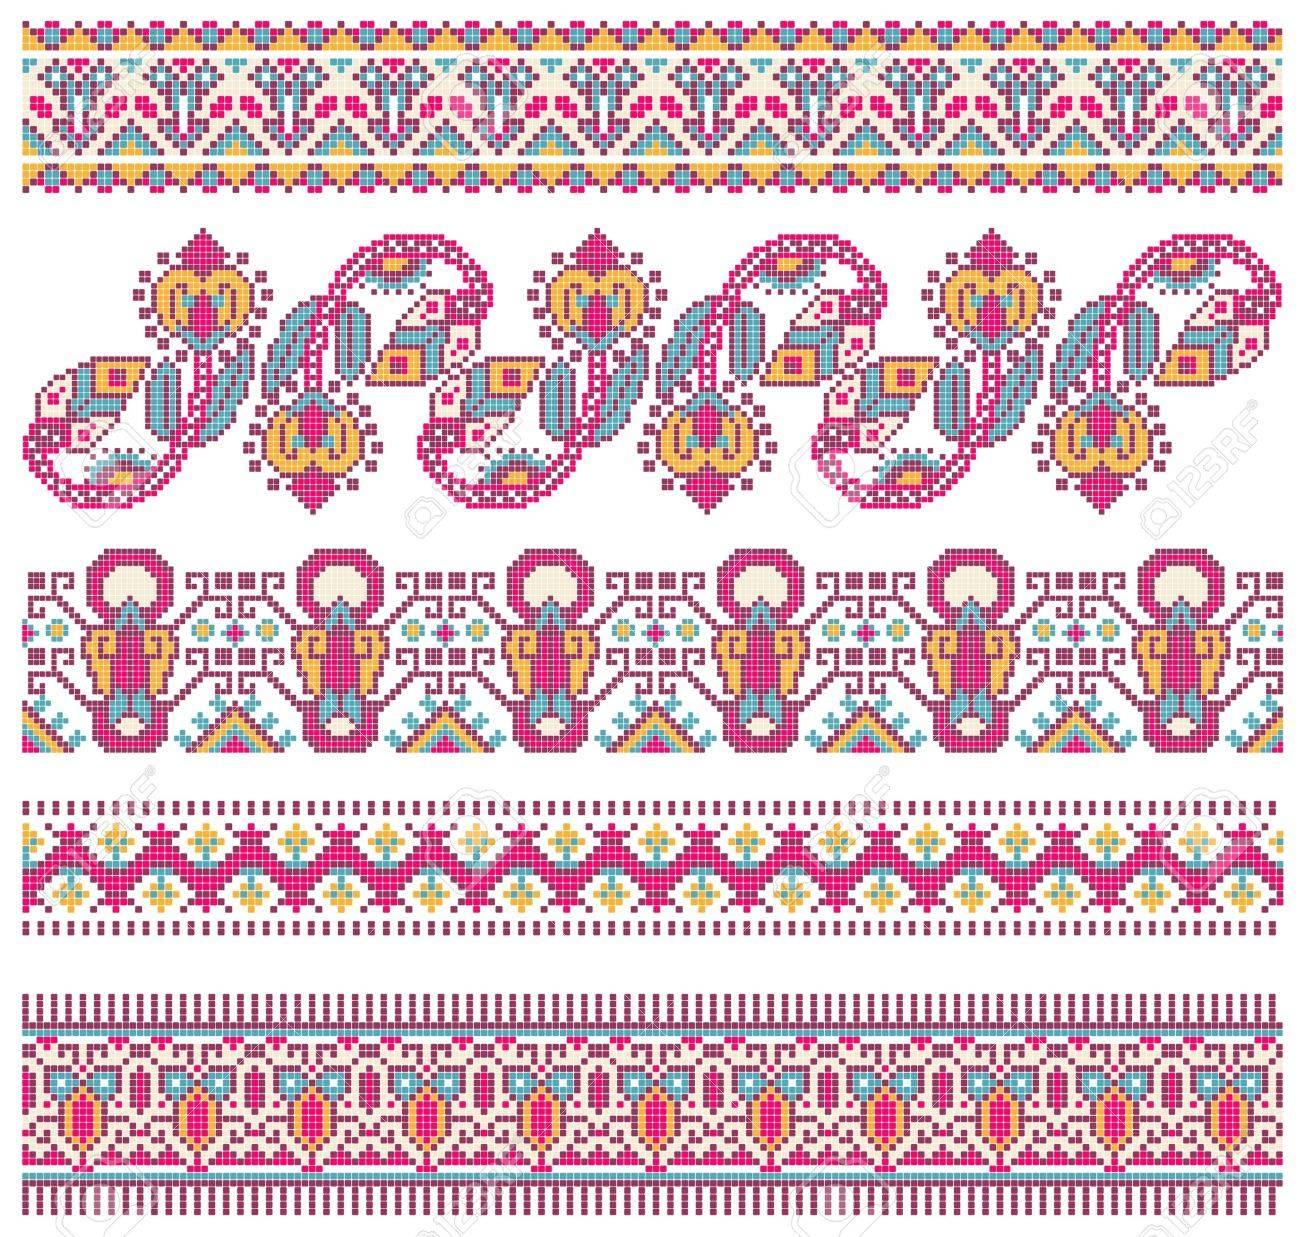 embroidered good like handmade cross-stitch ethnic Ukraine pattern Stock Vector - 11189106